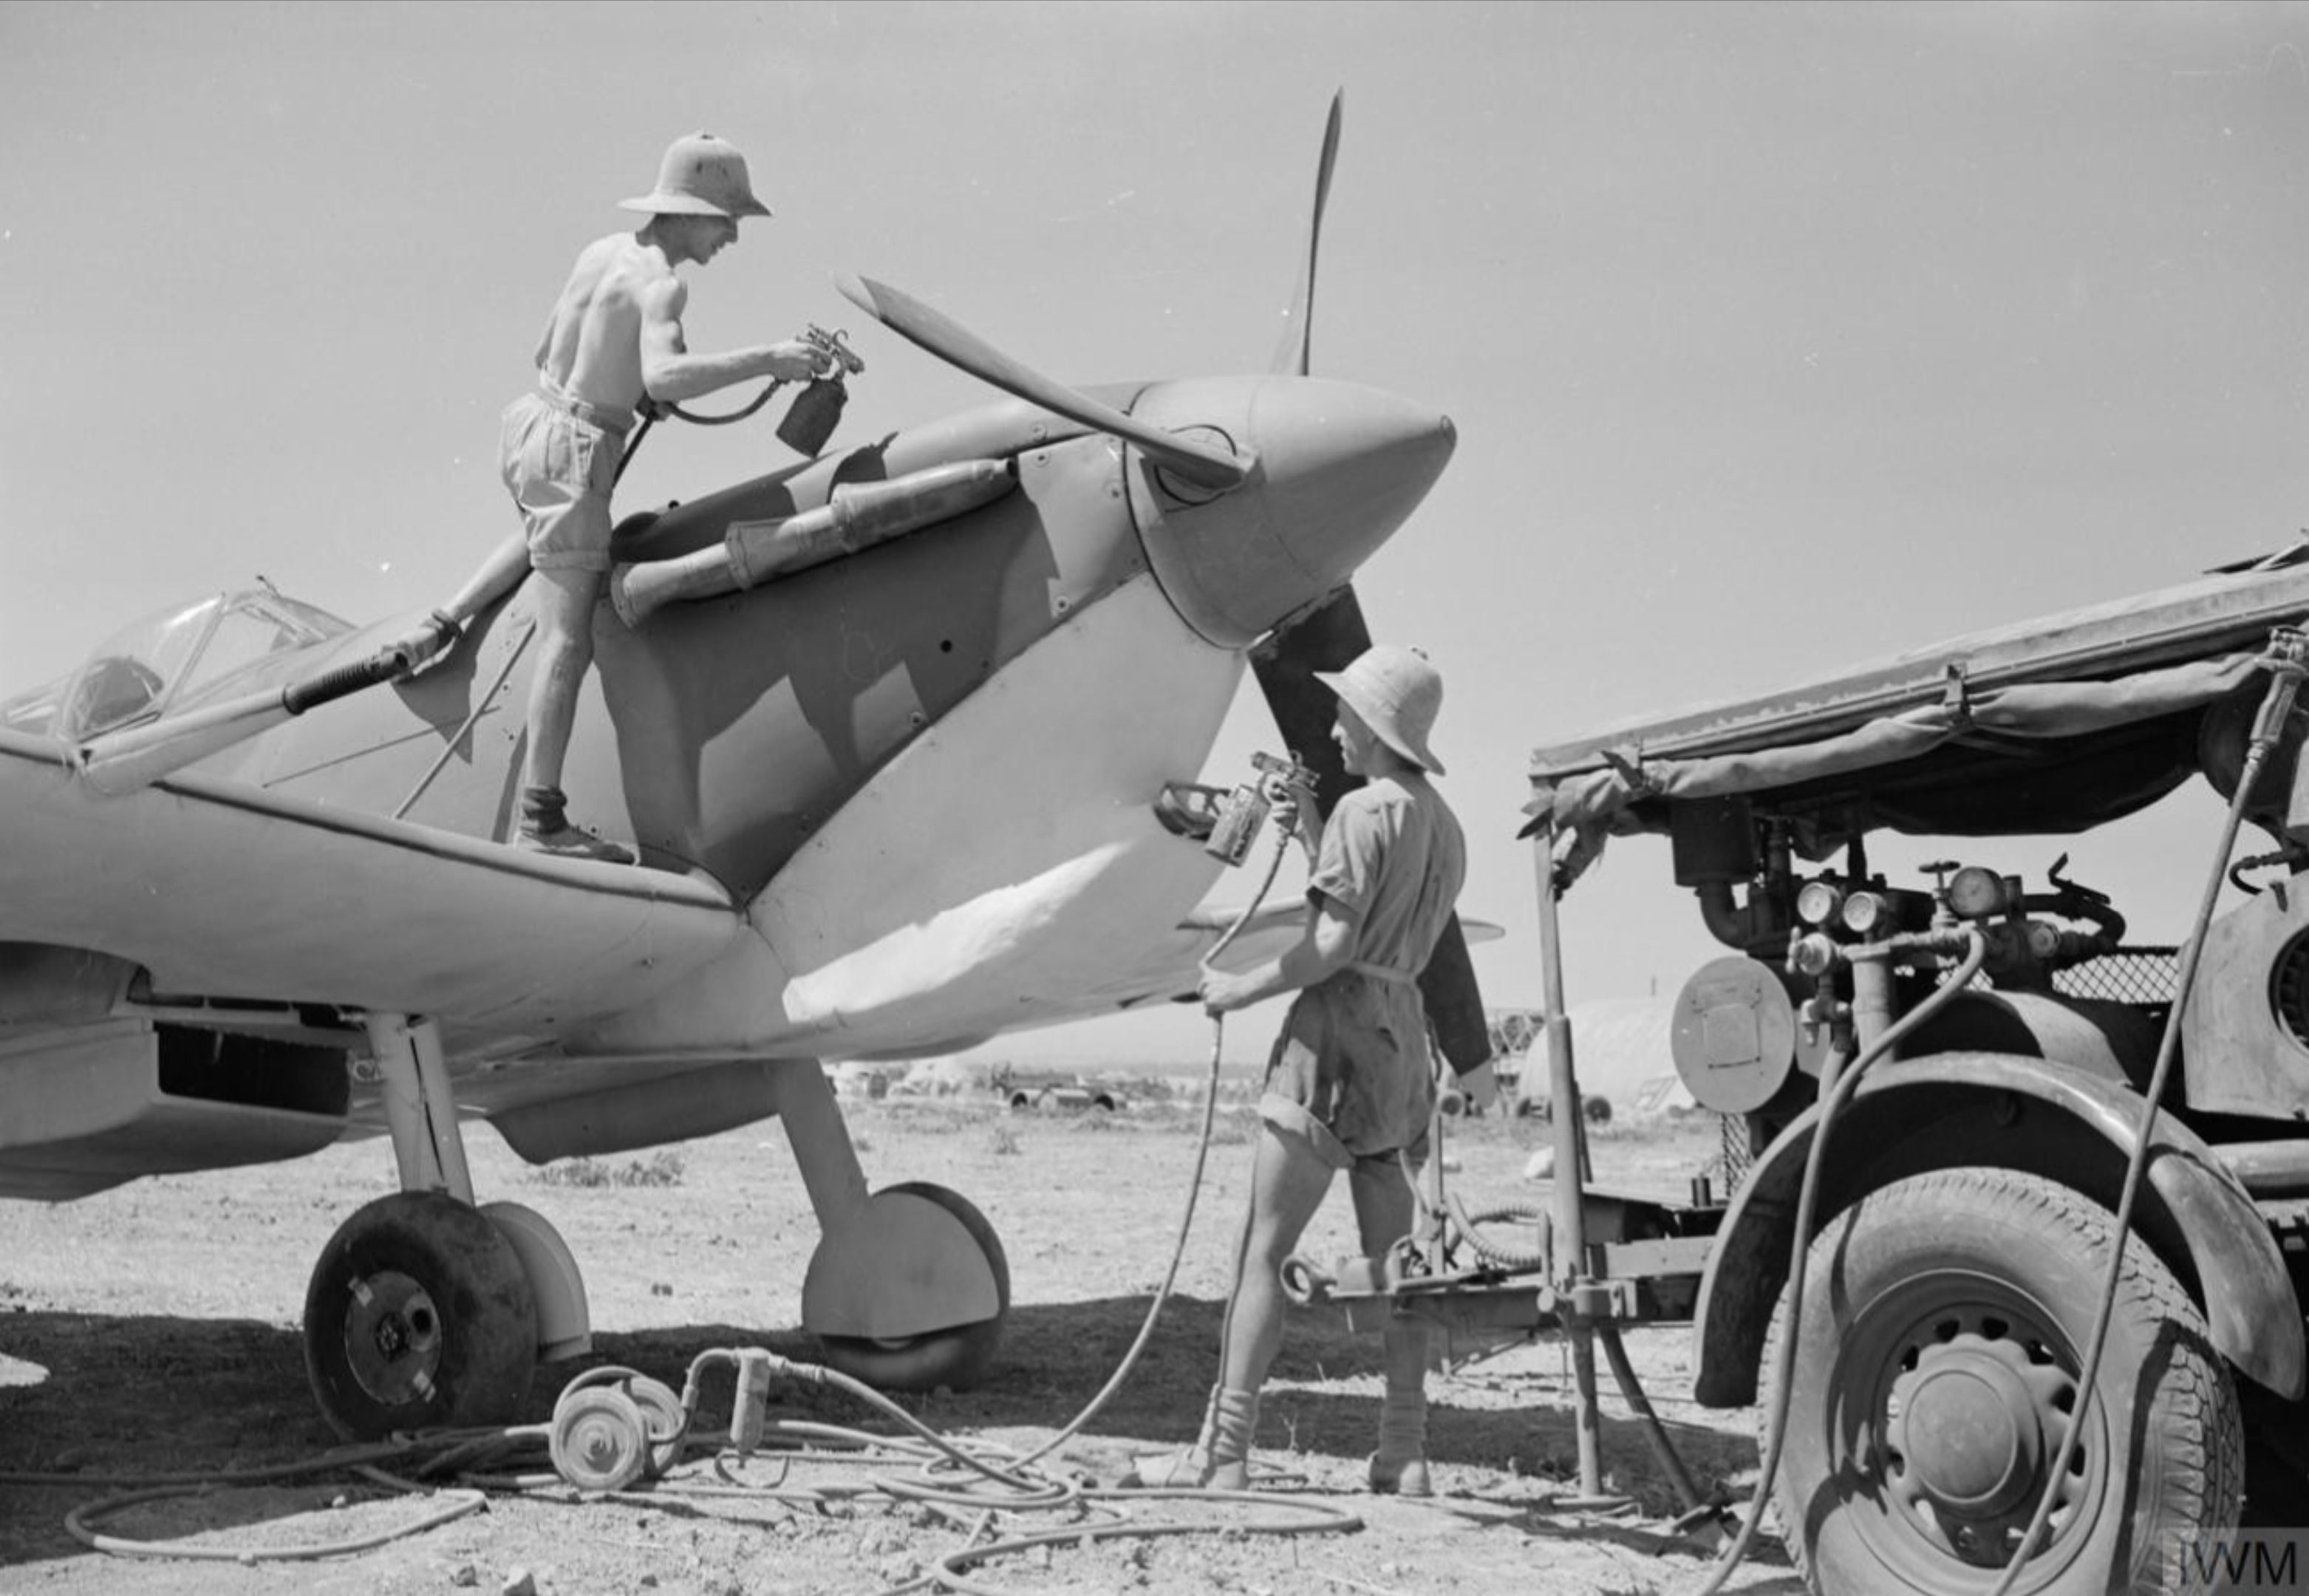 Spitfire MkVc RAF 144 Maintenance Unit at Maison Blanche Algeria IWM CNA2259